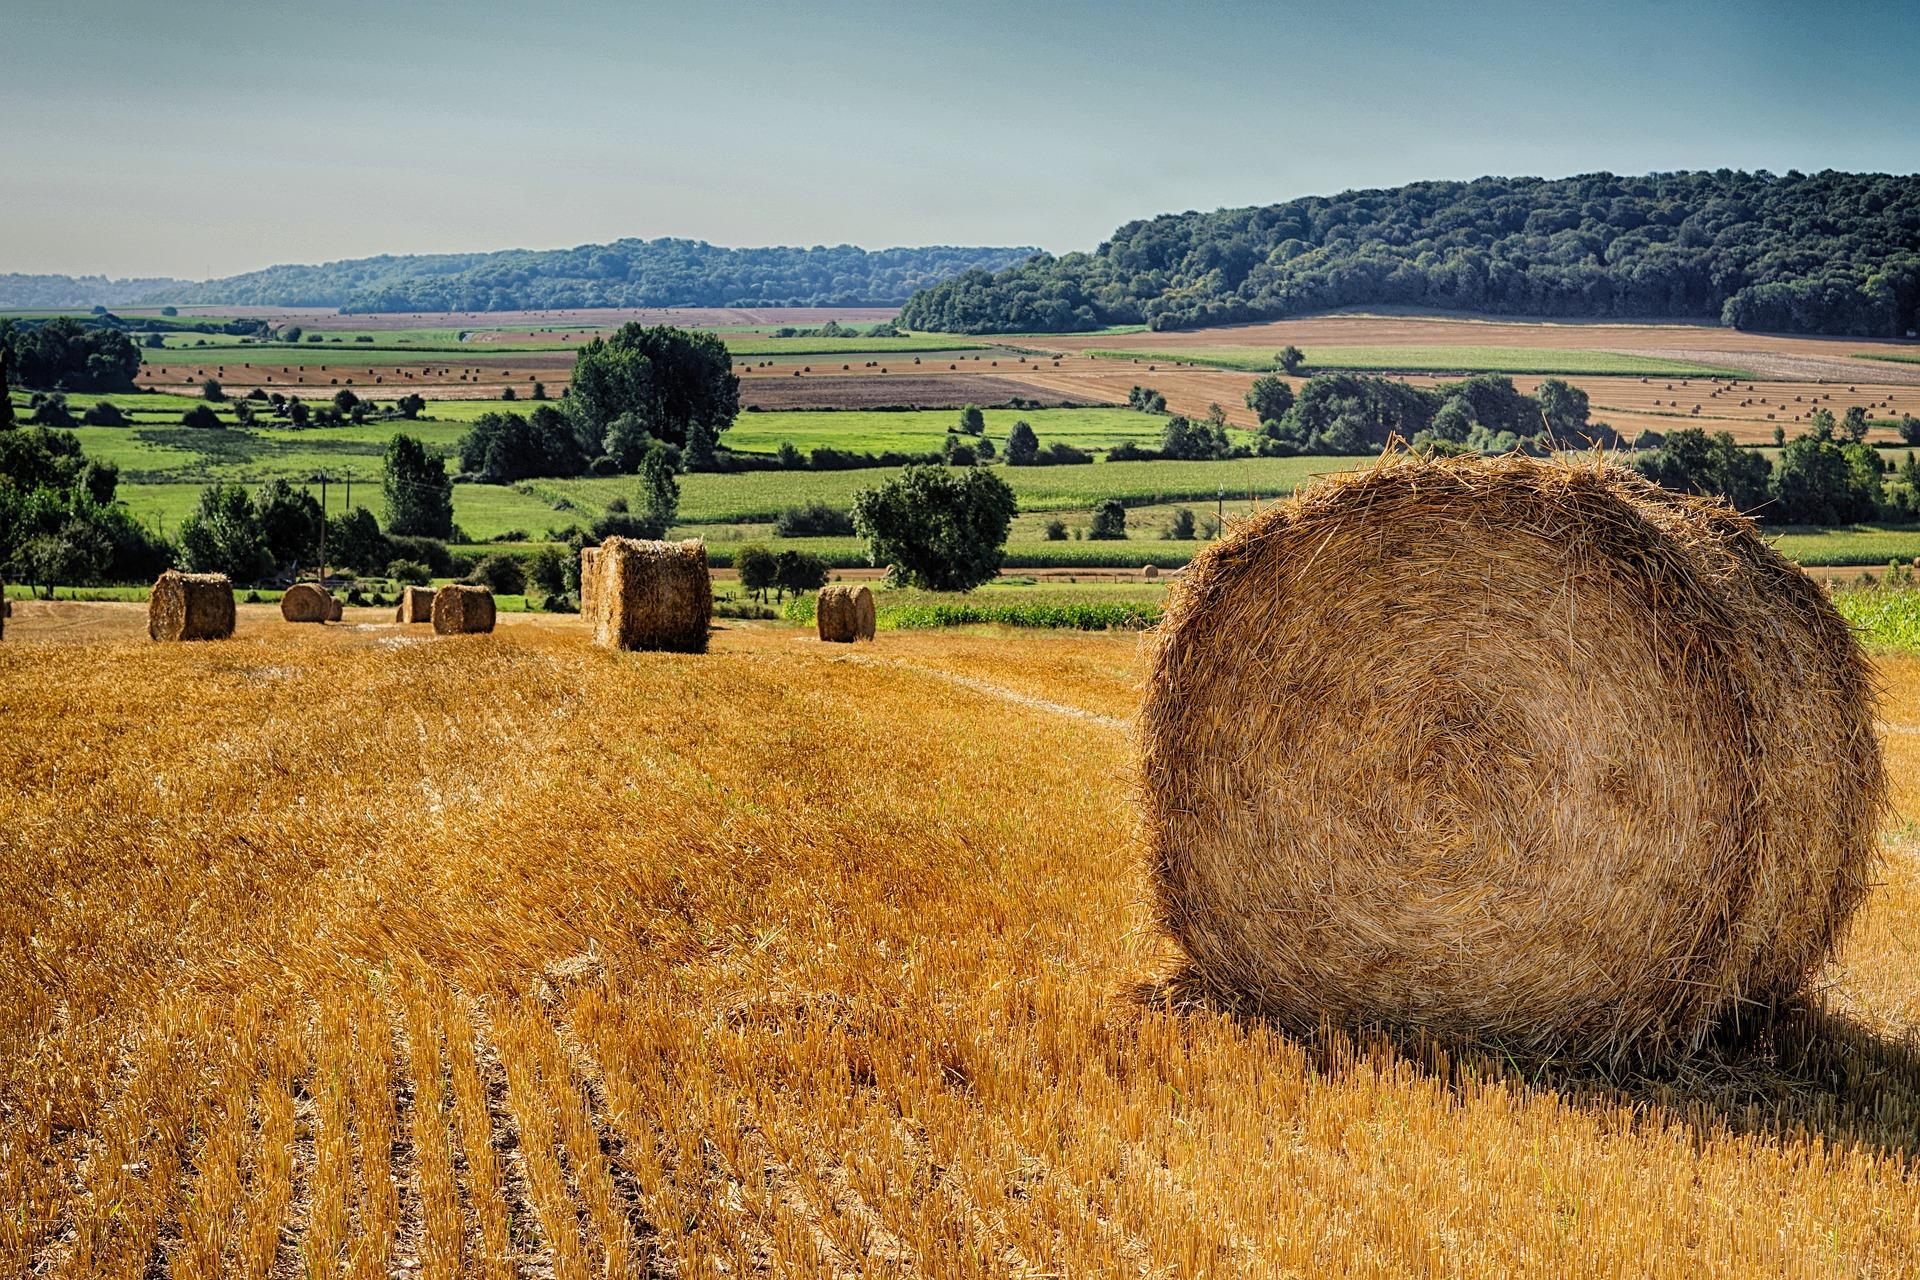 Фермер звинувачує голову ОТГ в земельному рейдерстві